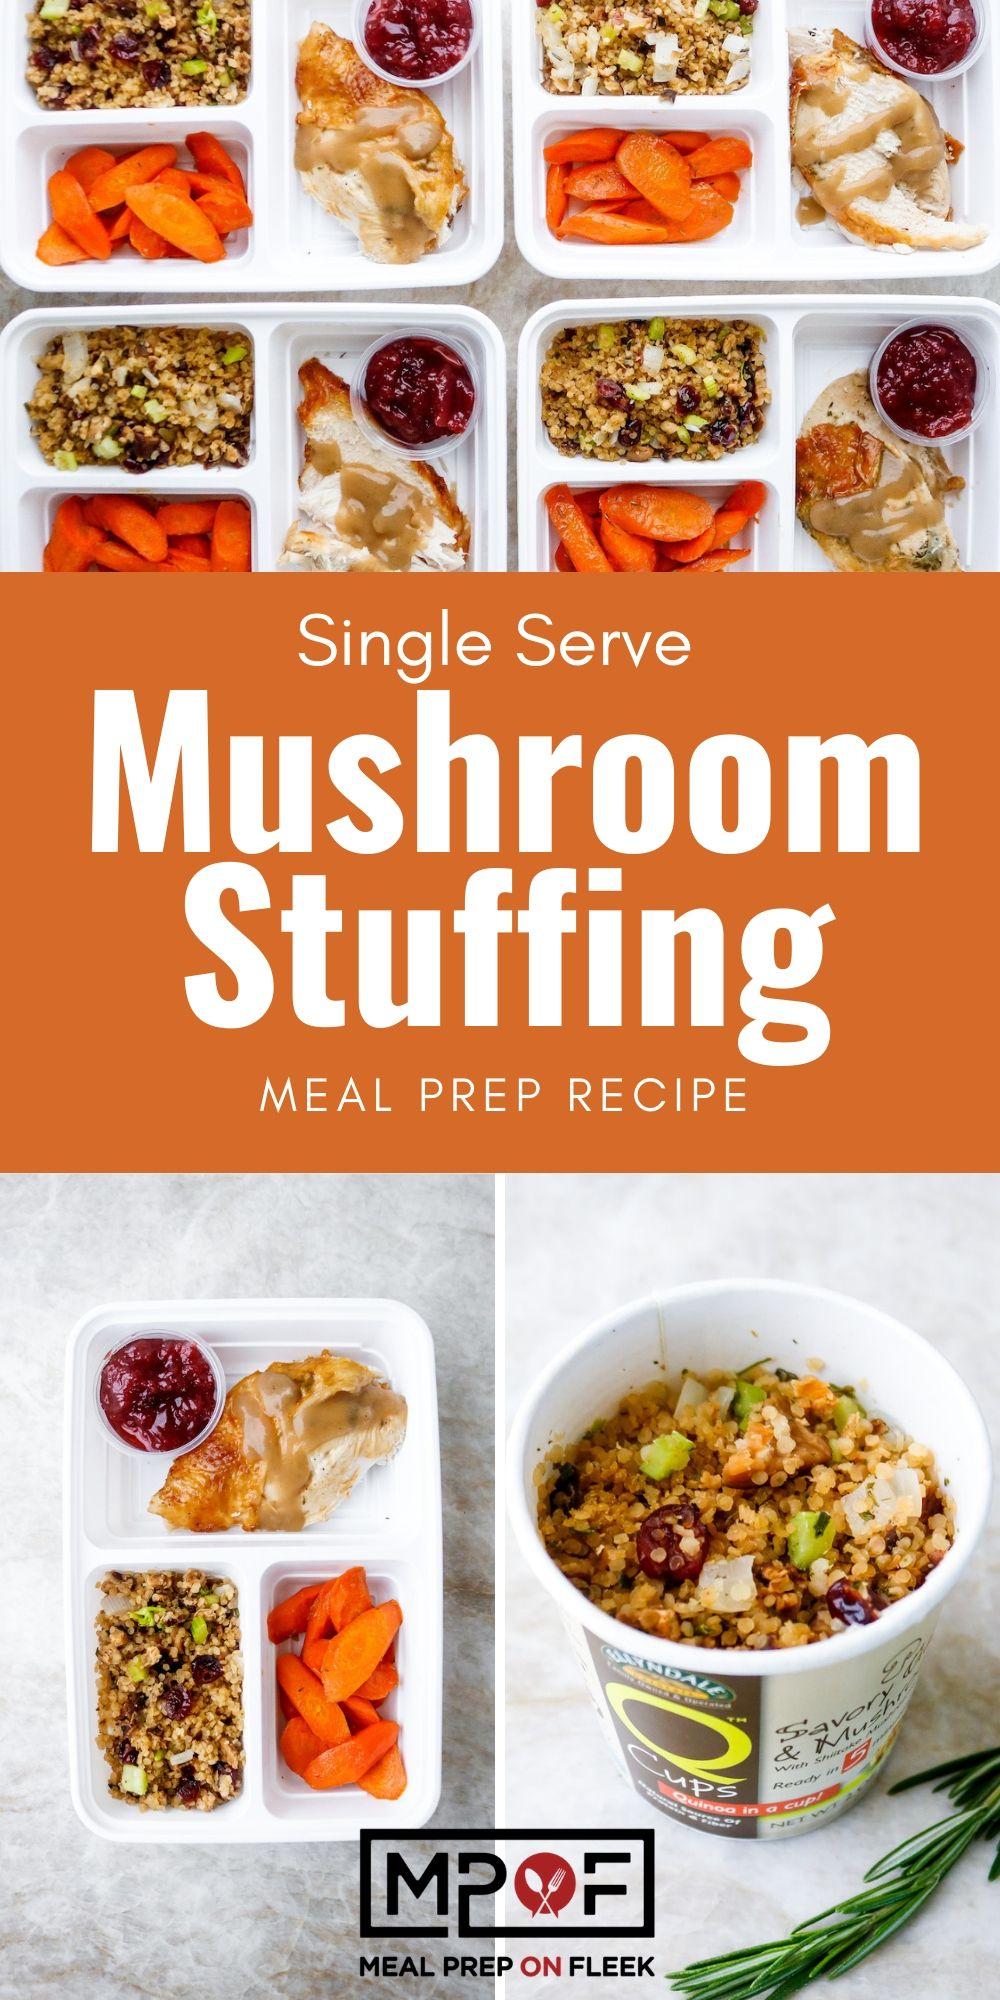 Single Serve Mushroom Q-Cup Stuffing